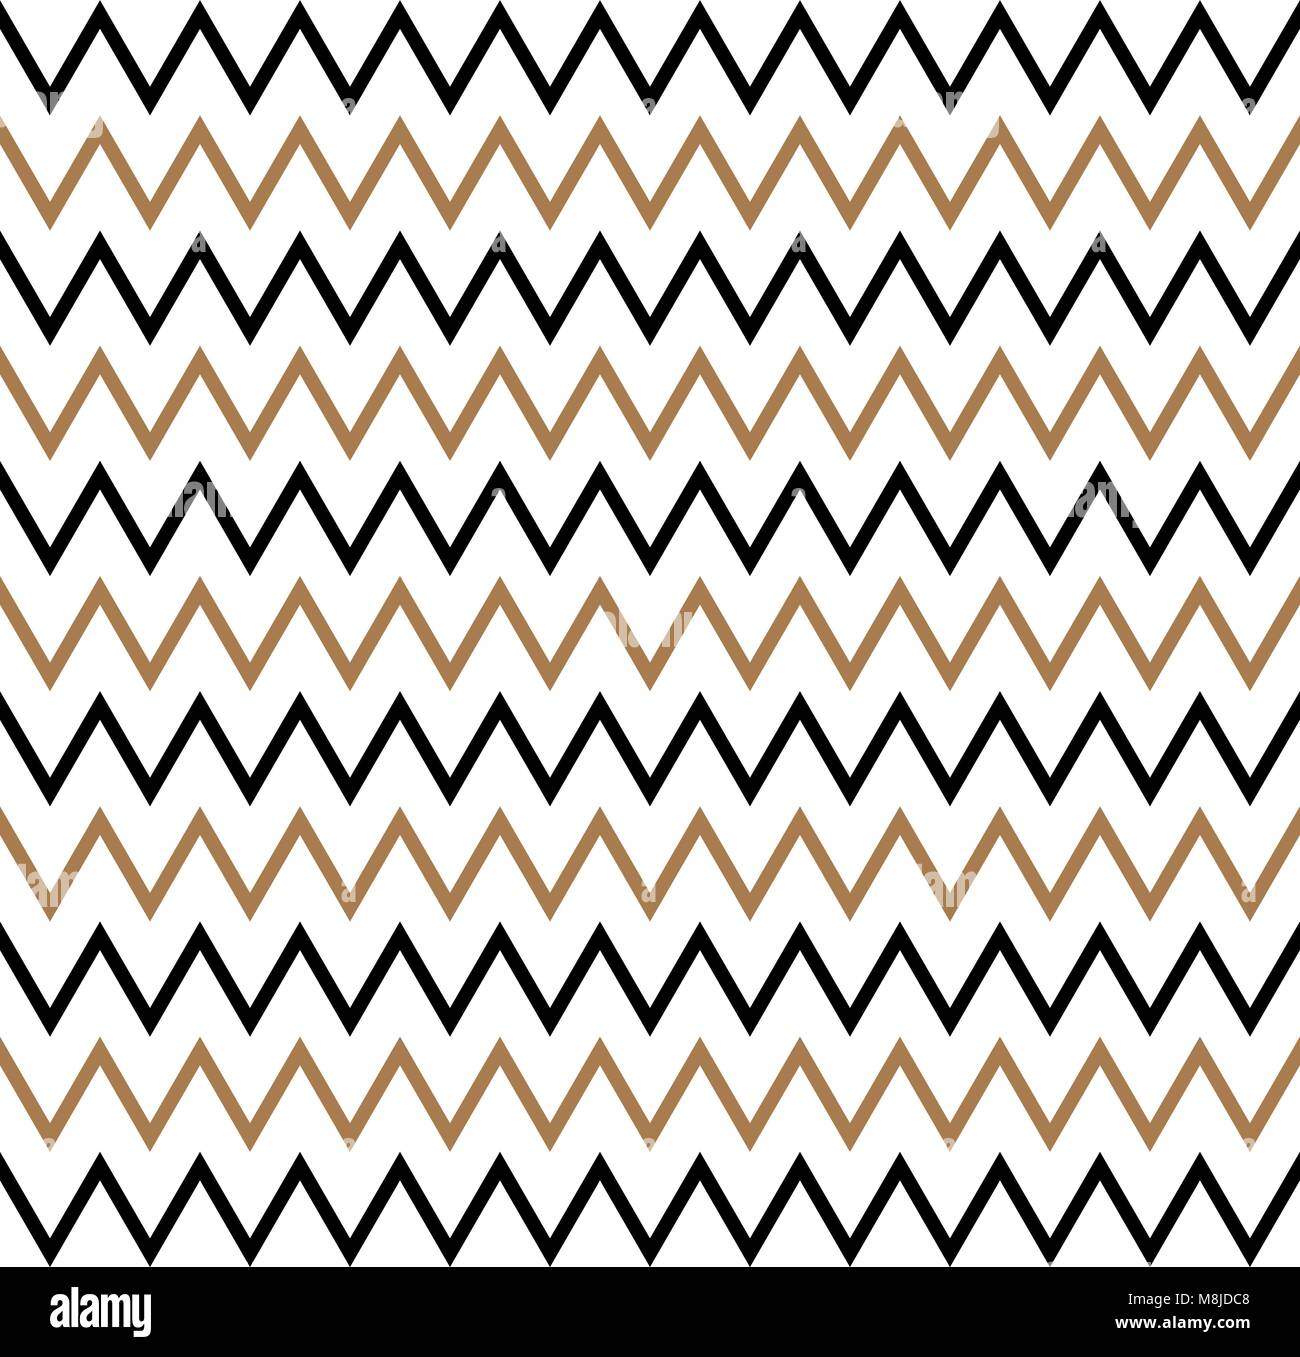 Geometric Black Gold Seamless Pattern Stockfotos & Geometric Black ...